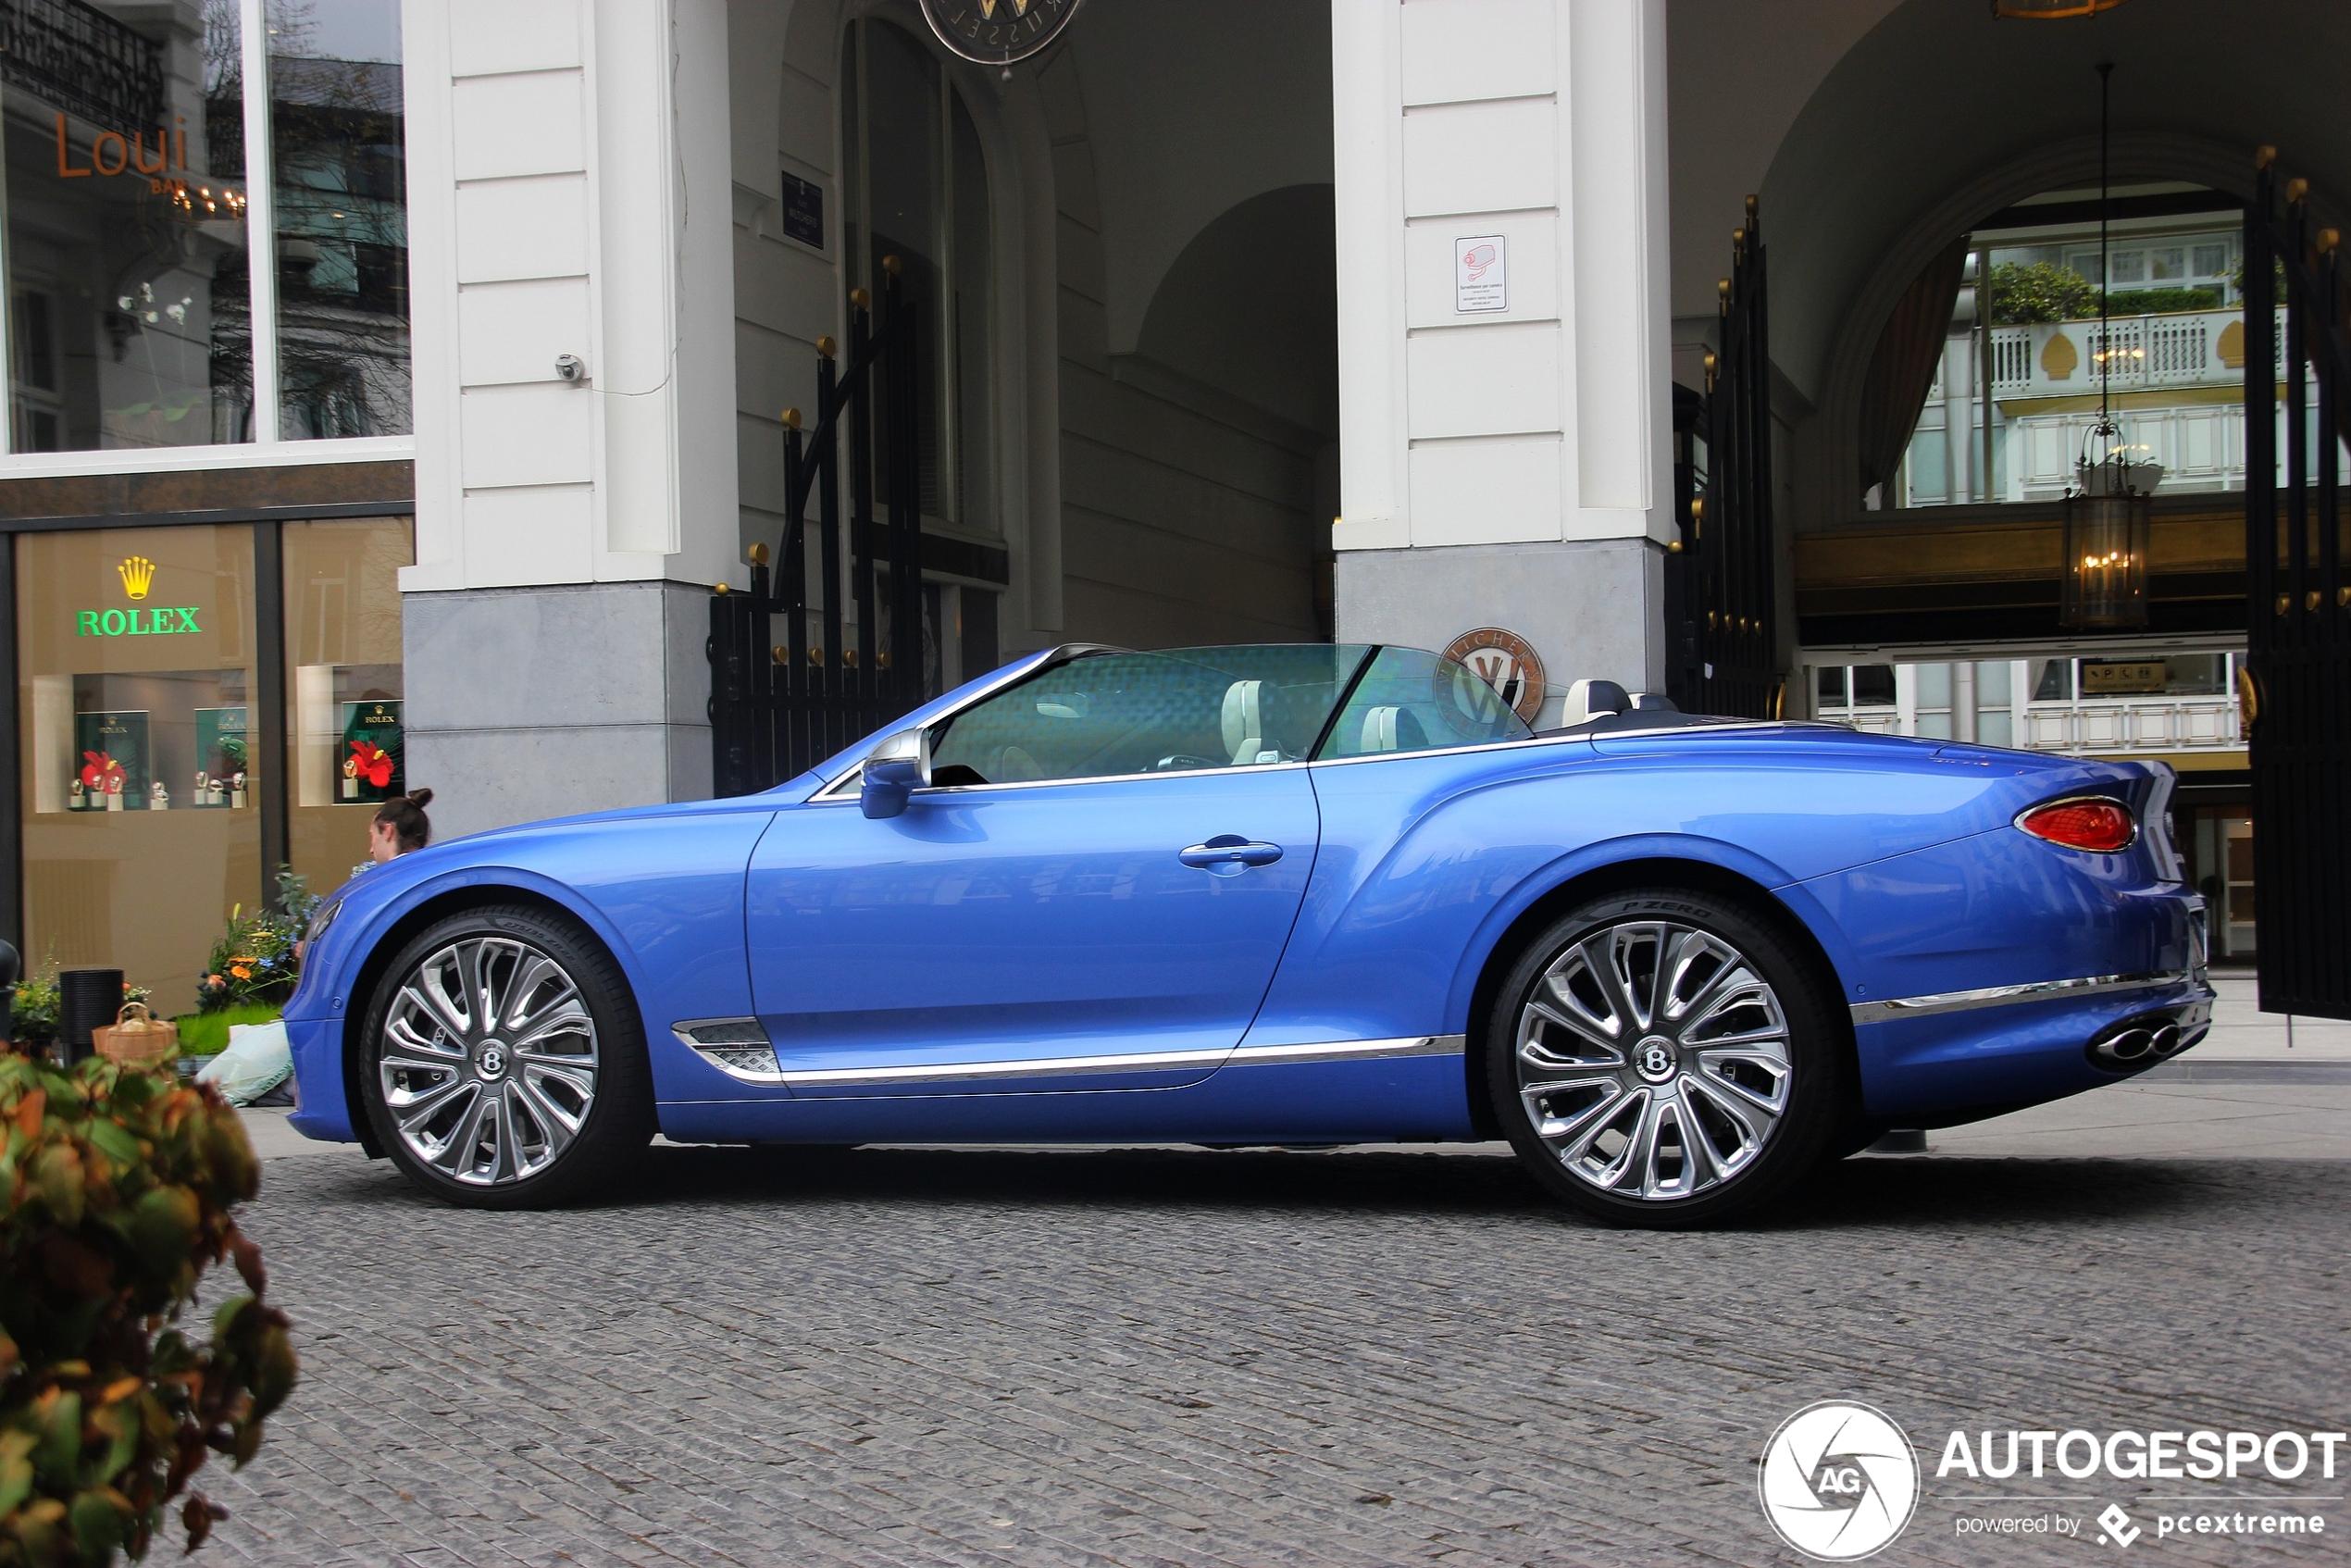 Prachtig debuut: Bentley Continental GTC V8 2020 Mulliner